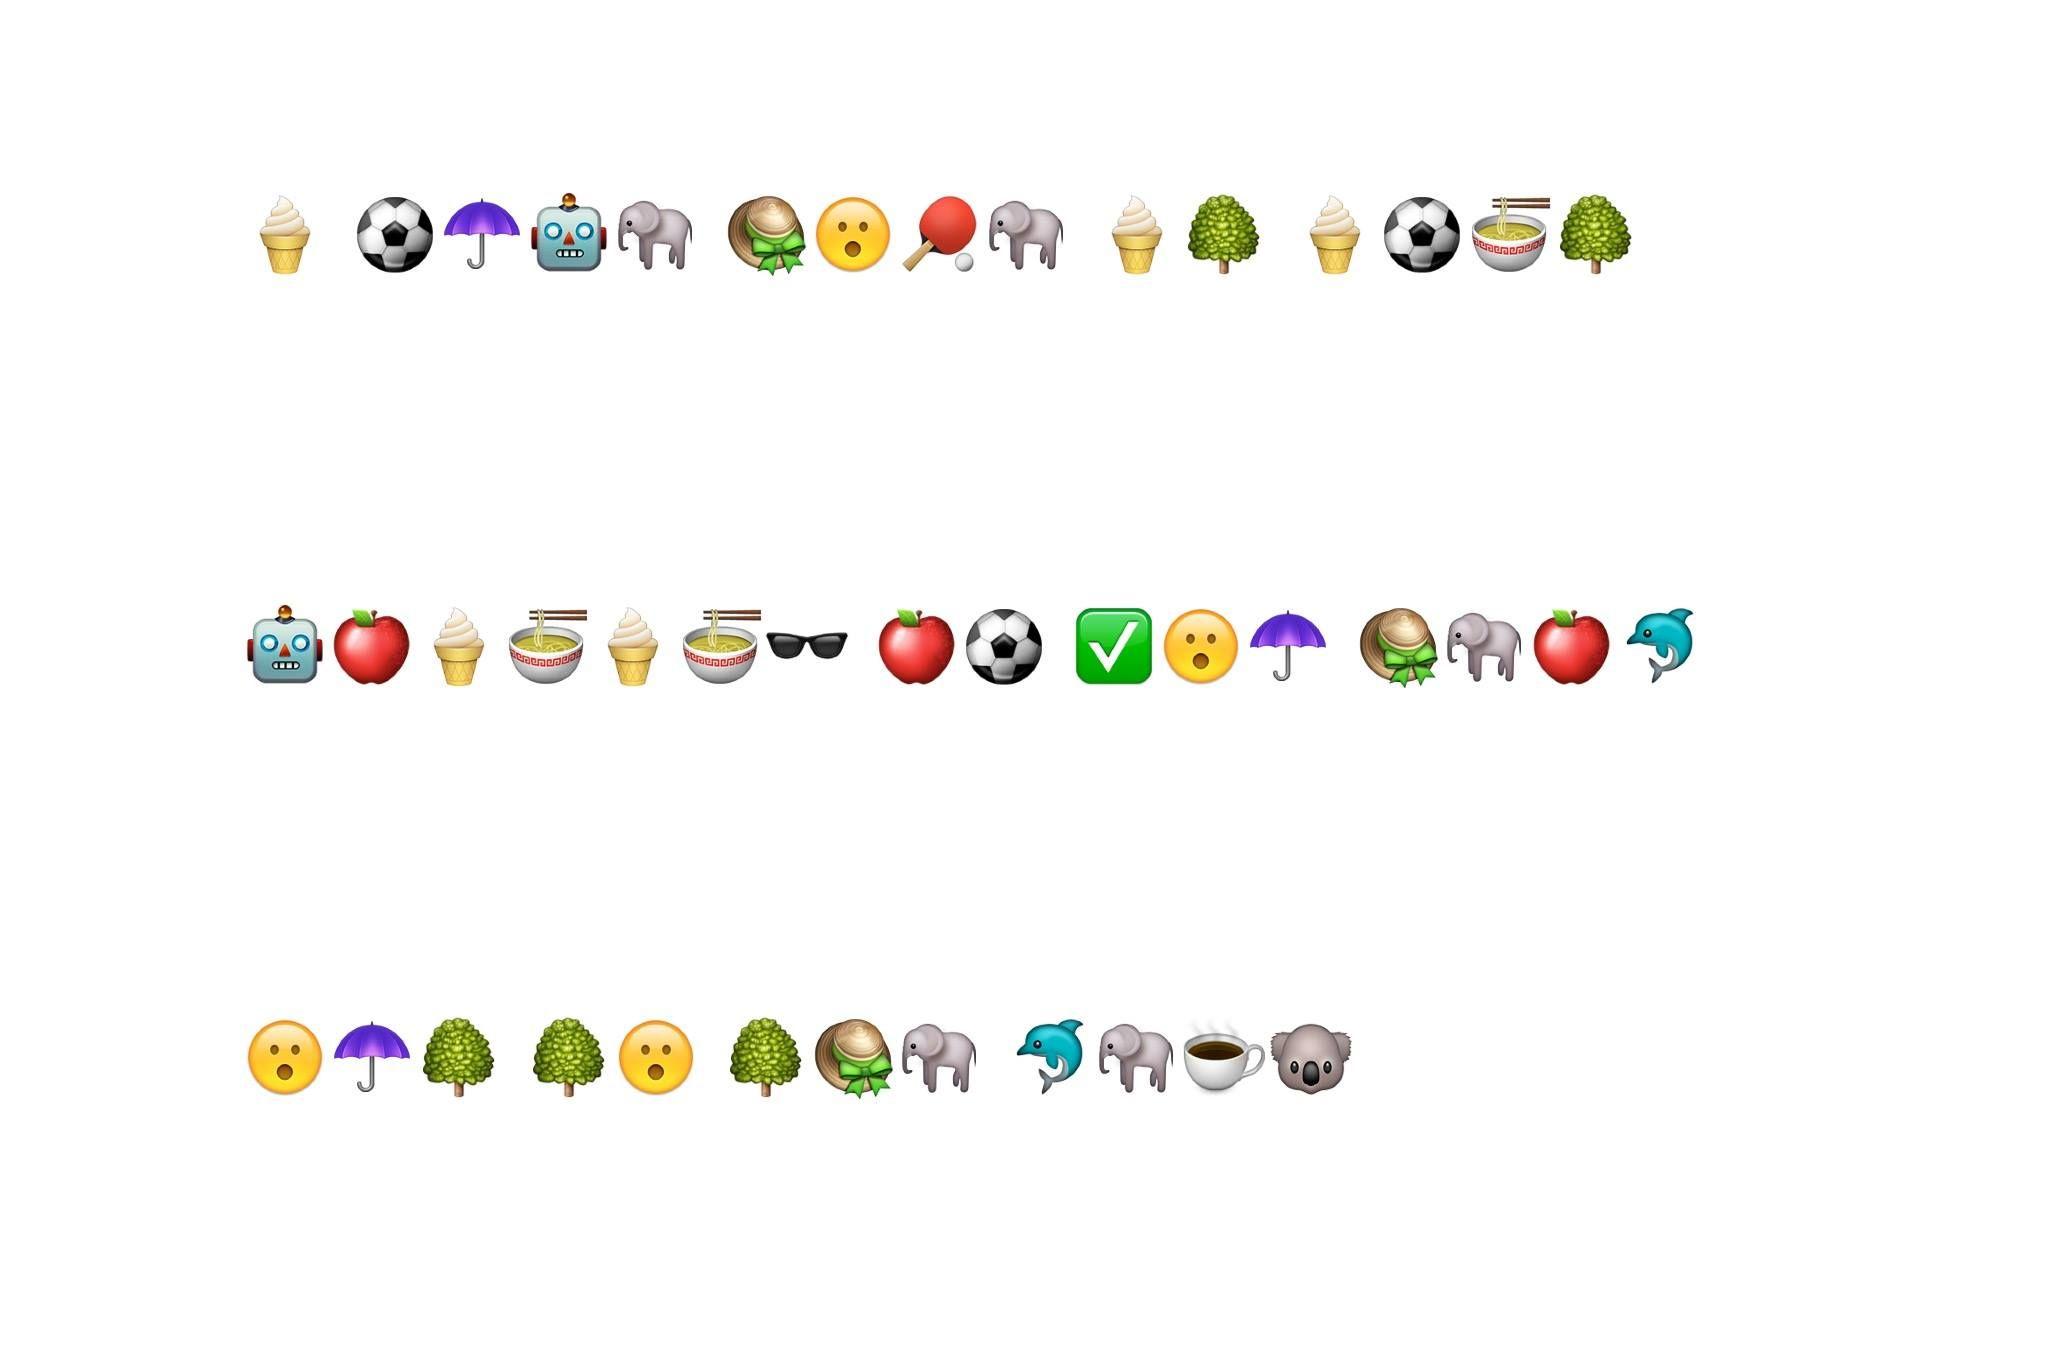 Emoji code for a breakout clue | Breakout | Pinterest | Emoji codes